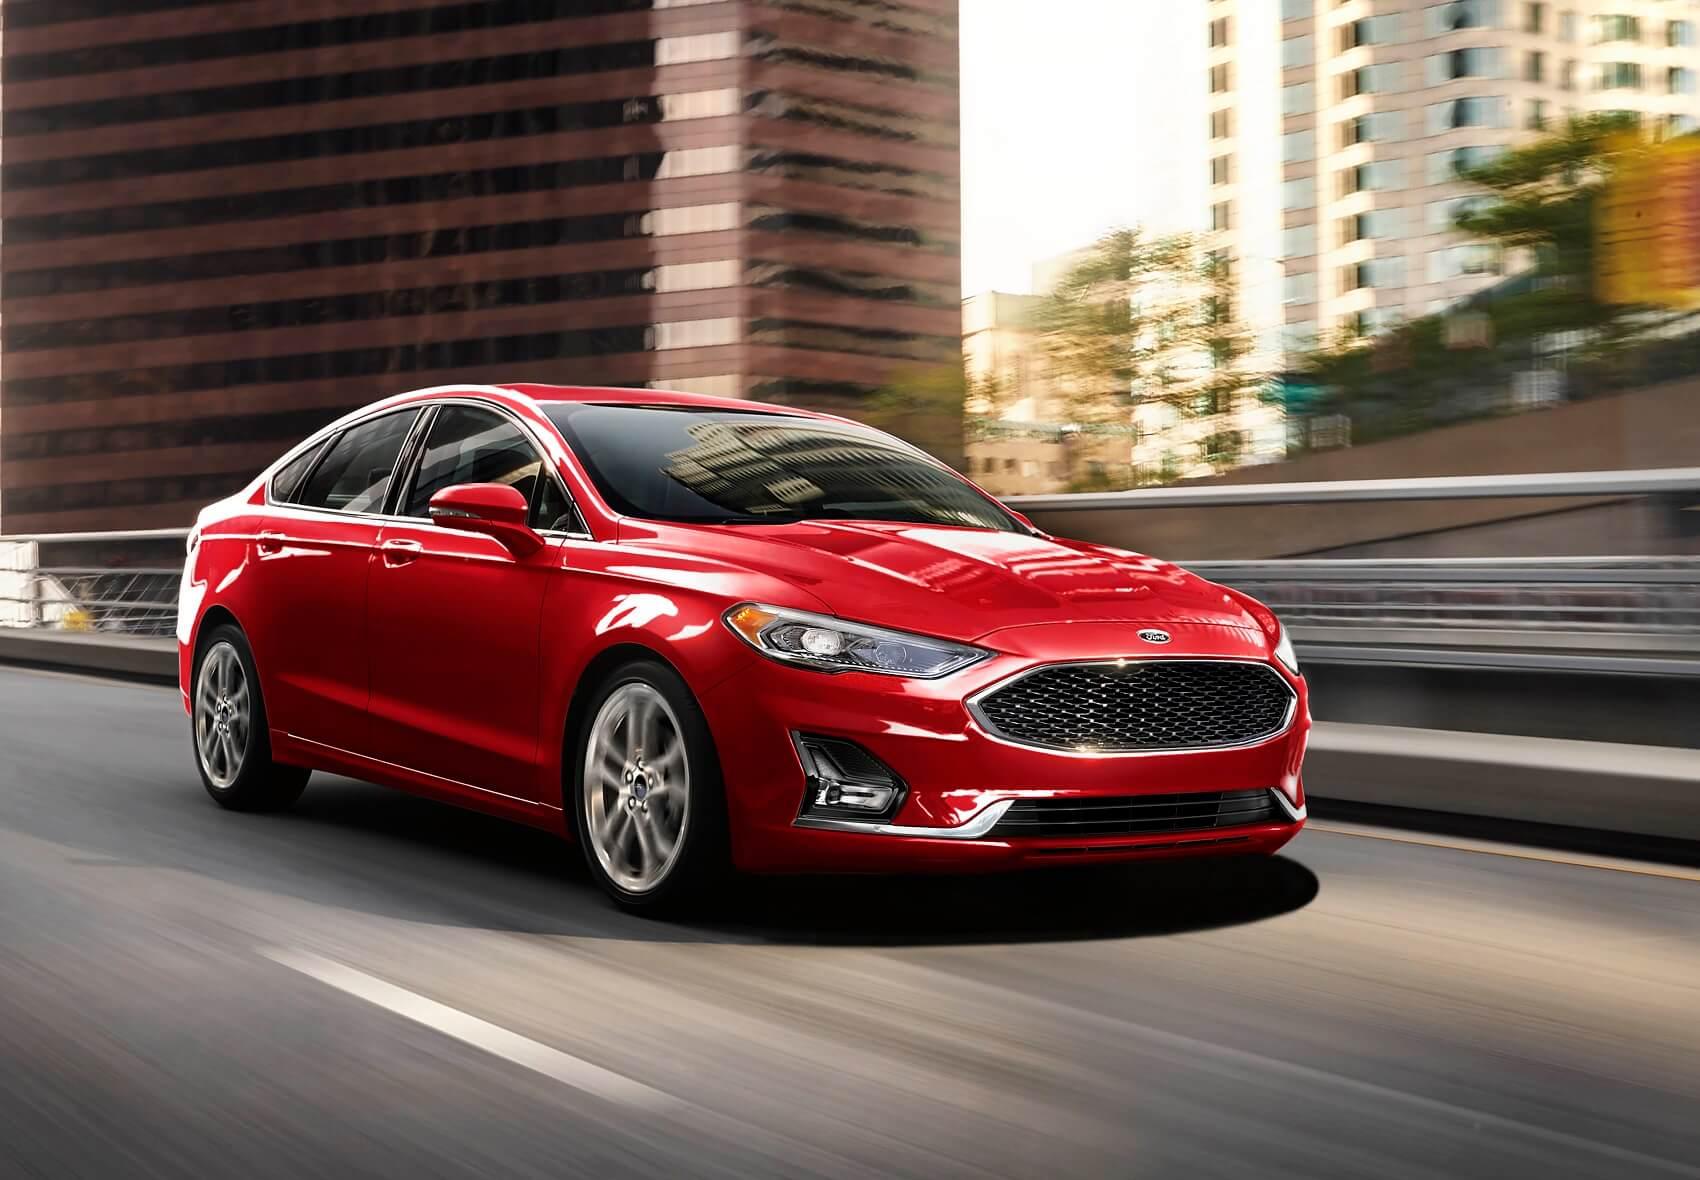 Ford Fusion 2020 Review.2020 Ford Fusion Review Harvey La Bohn Ford